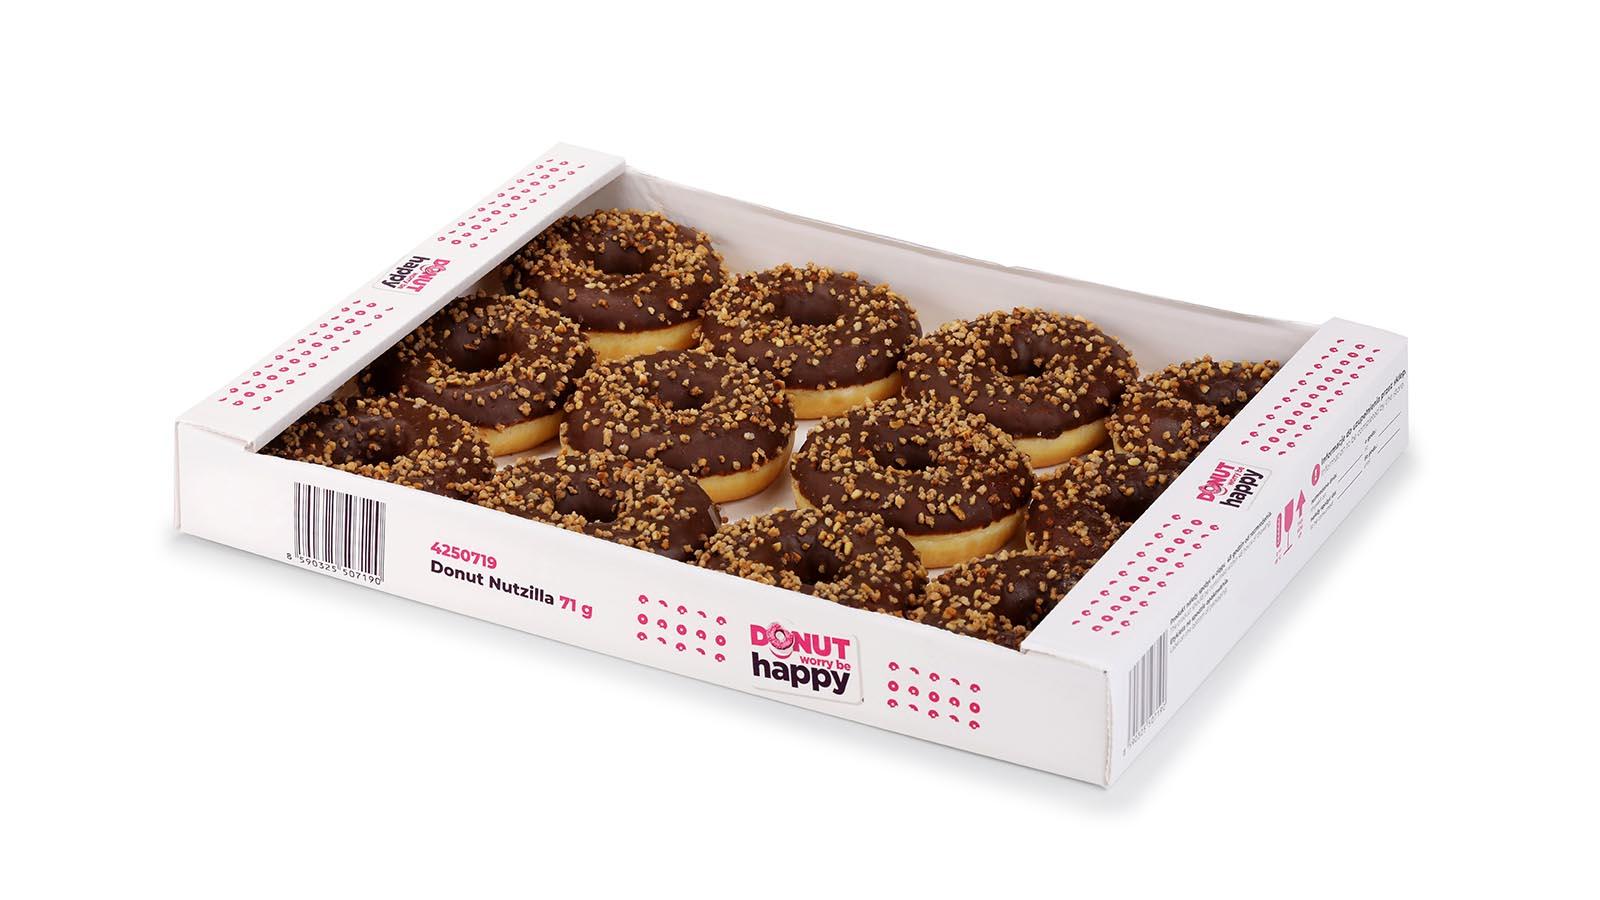 Donut Nutzilla with hazelnut filling (tray)